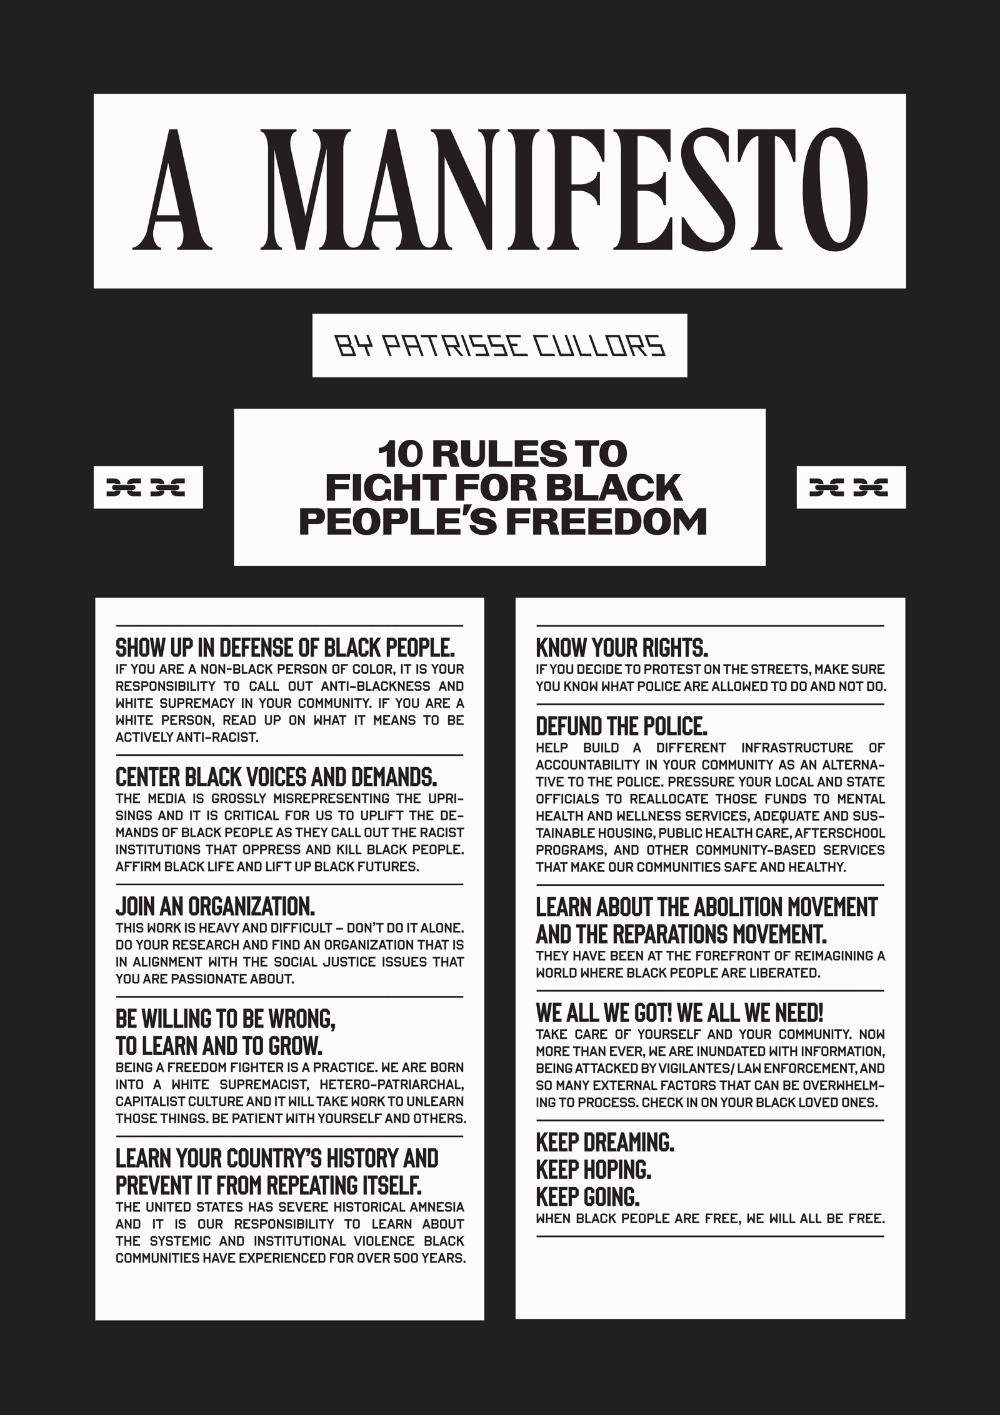 Wepresent A Manifesto By Patrisse Cullors Manifesto Lettering Black Person